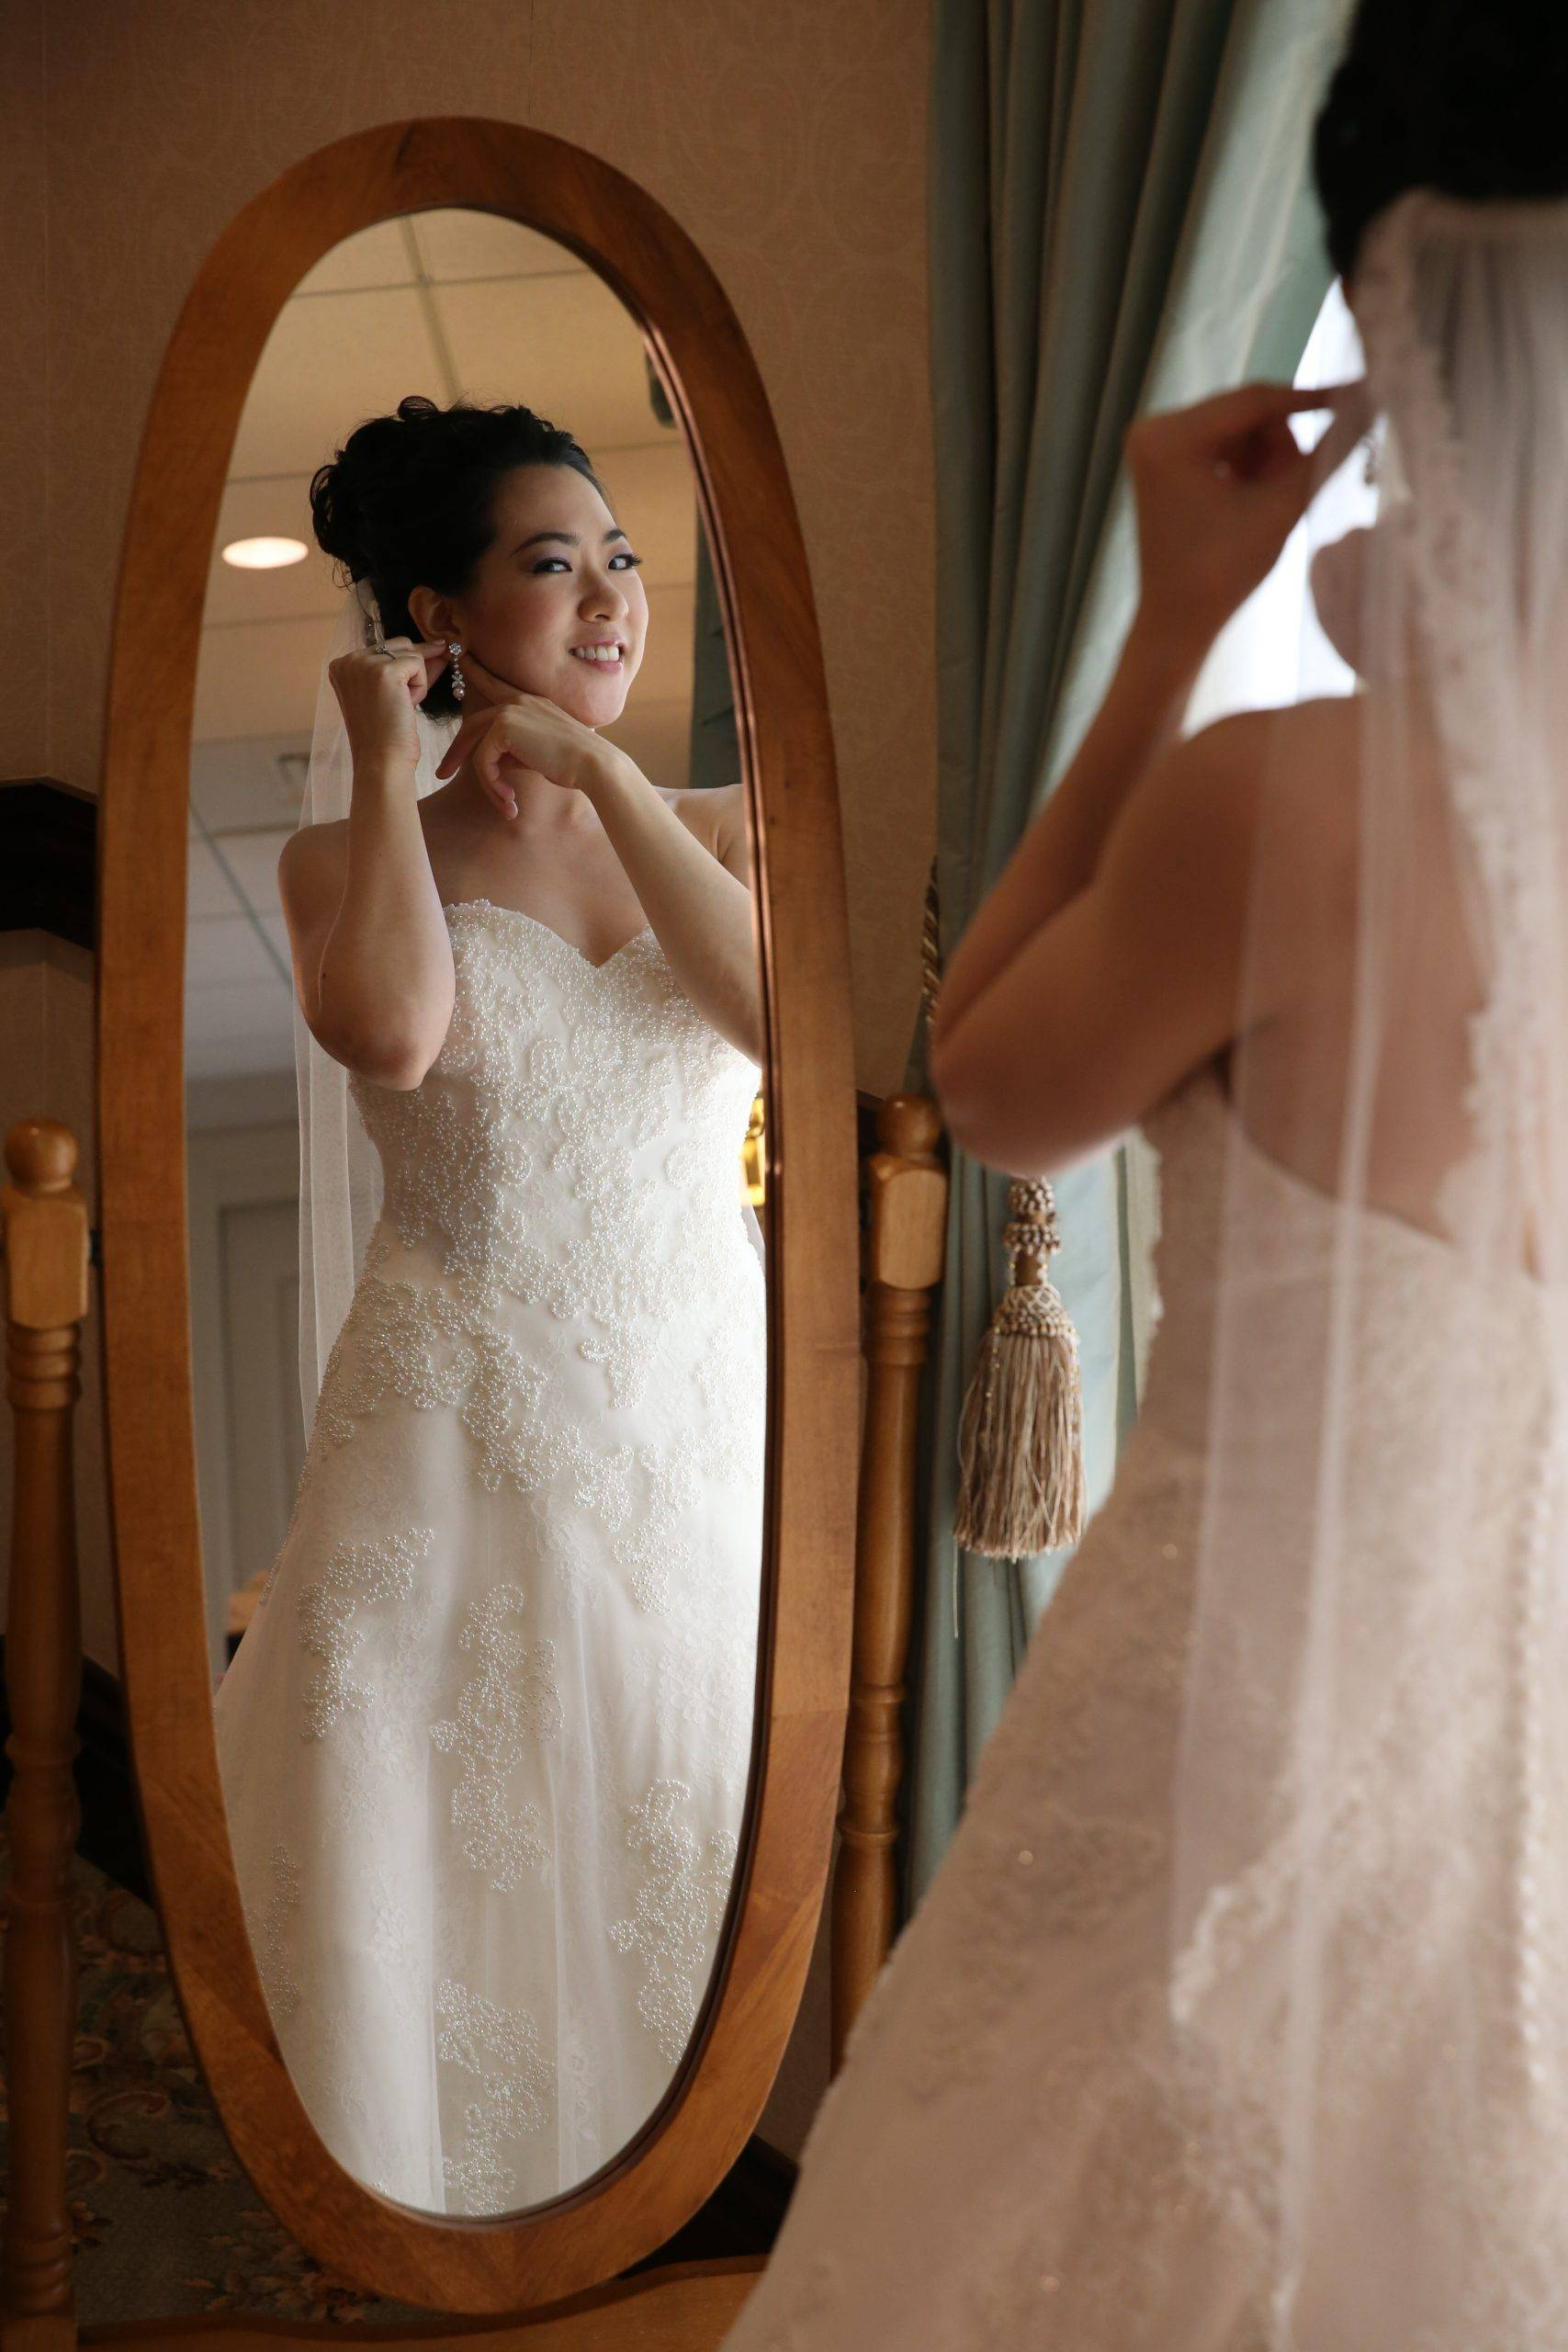 Brooklake bride getting ready in mirror